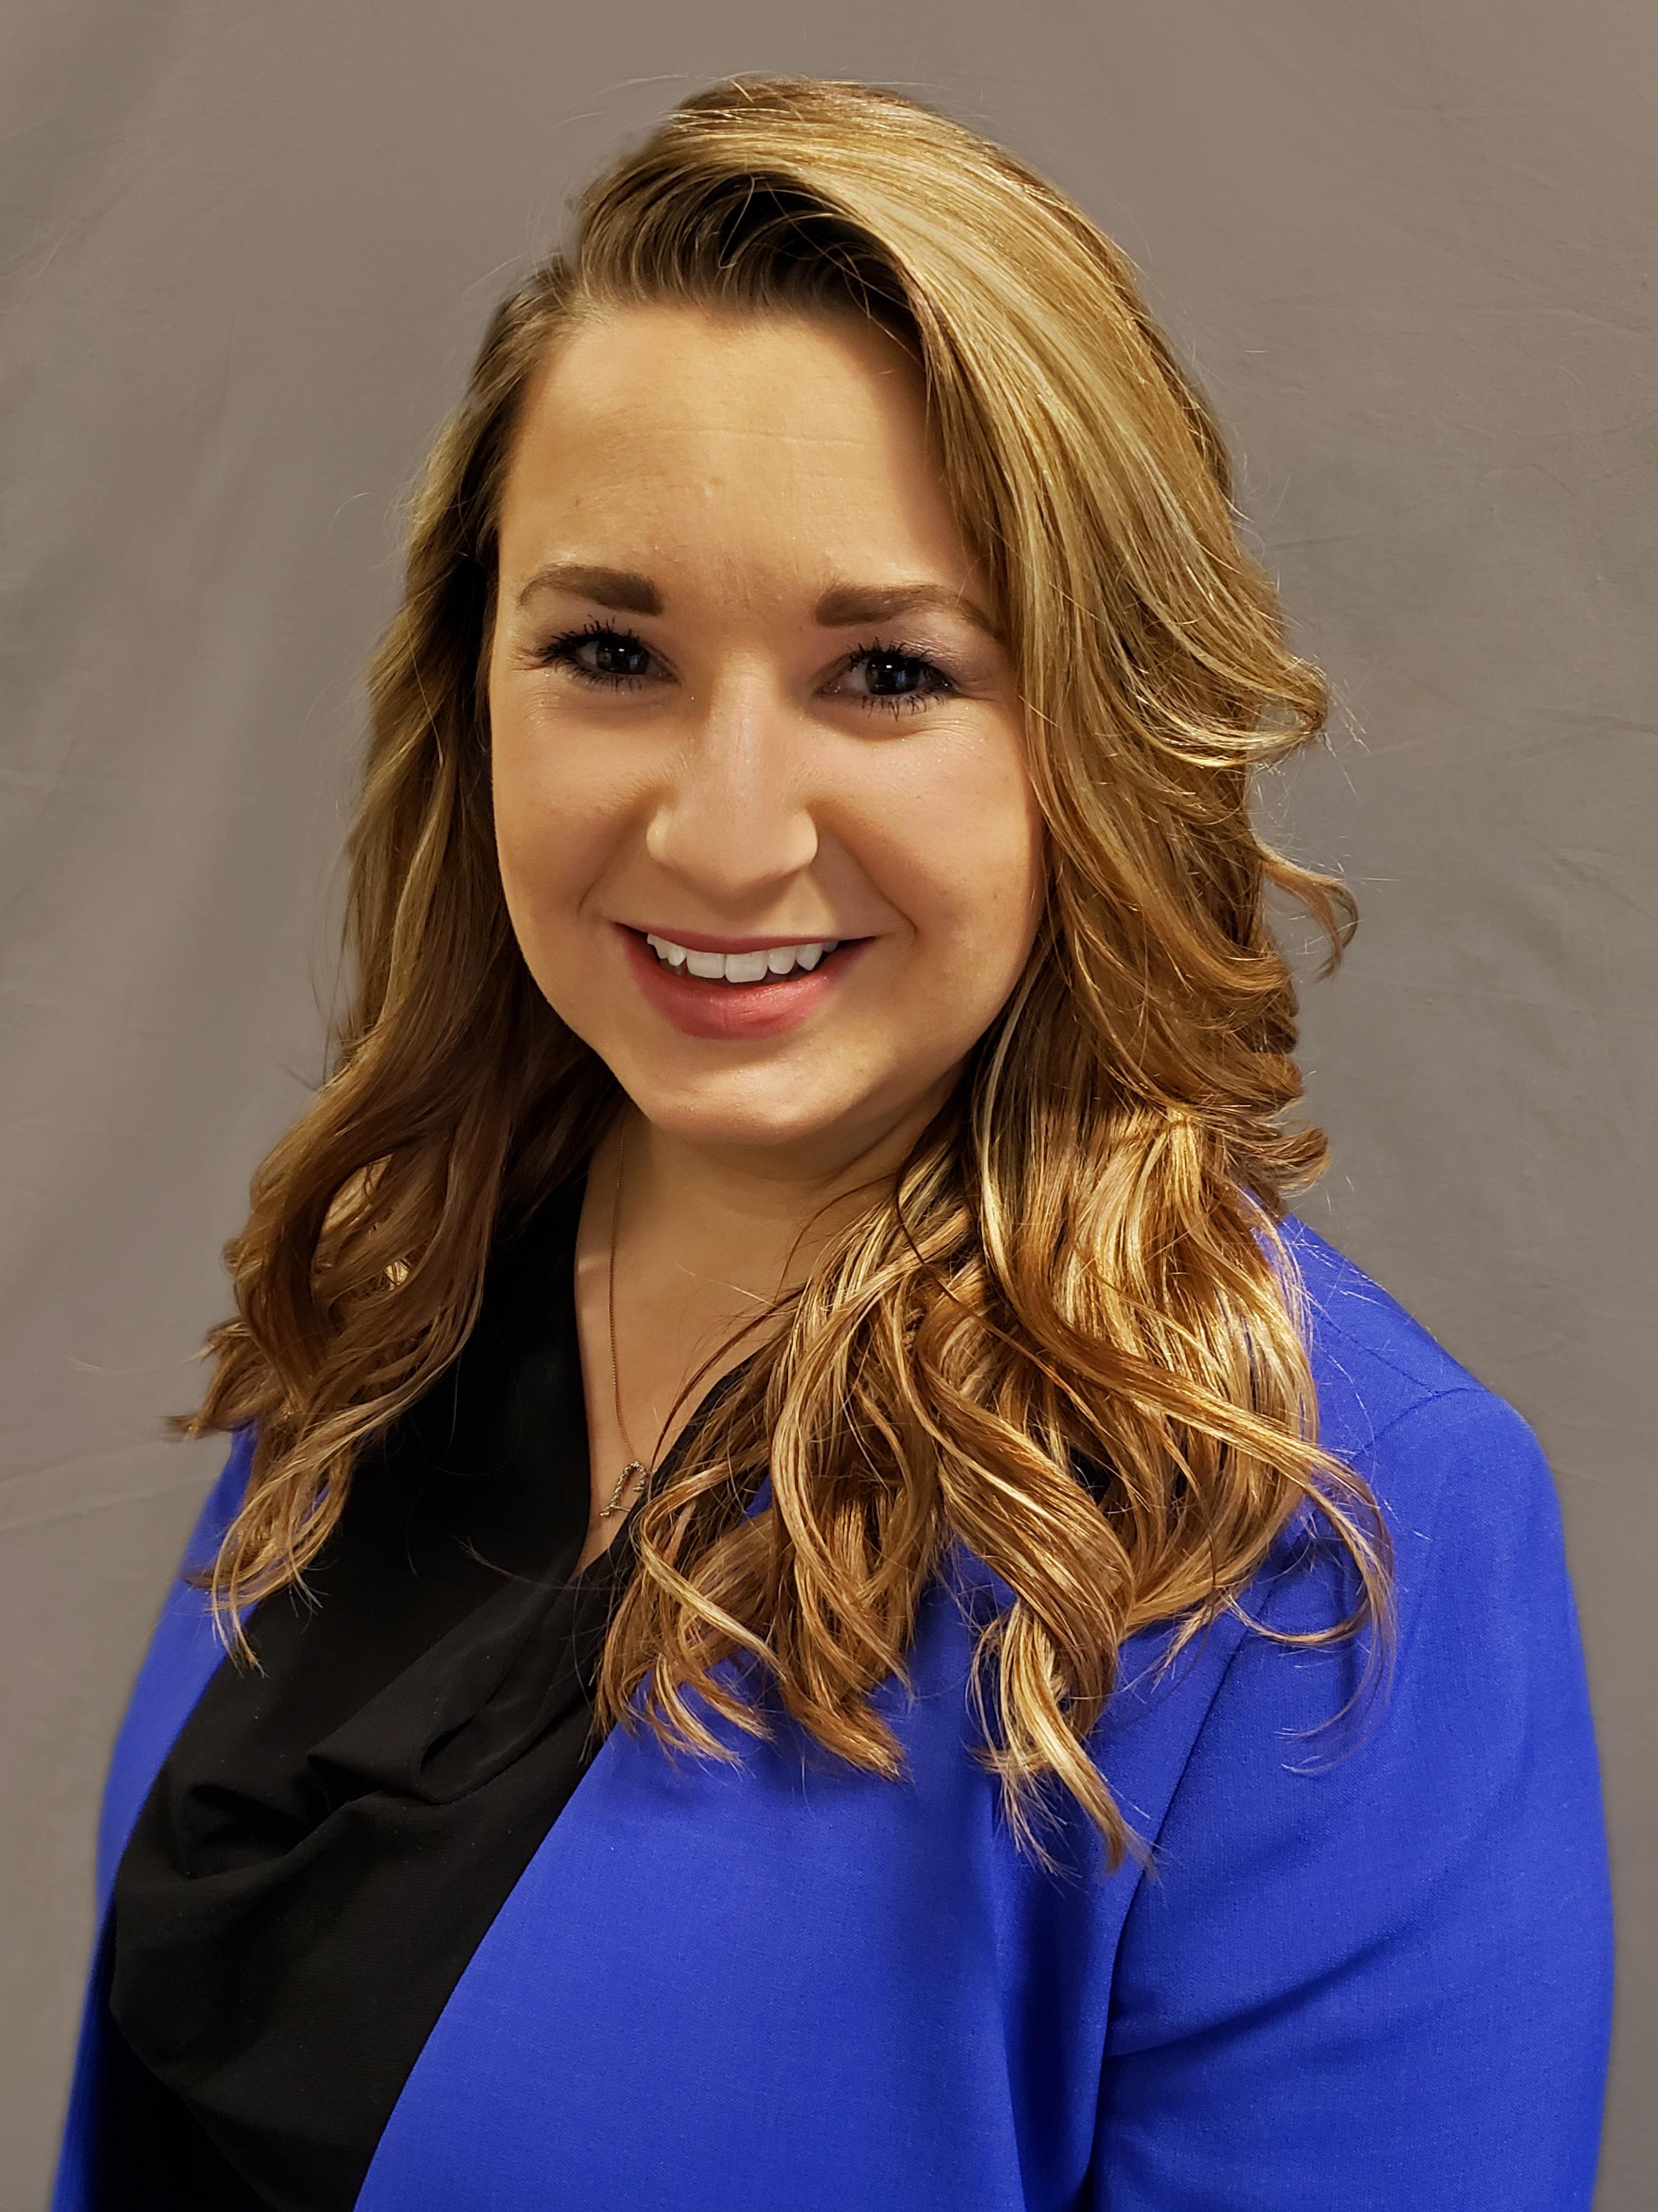 Mandy Lynch, HFA, President and CEO